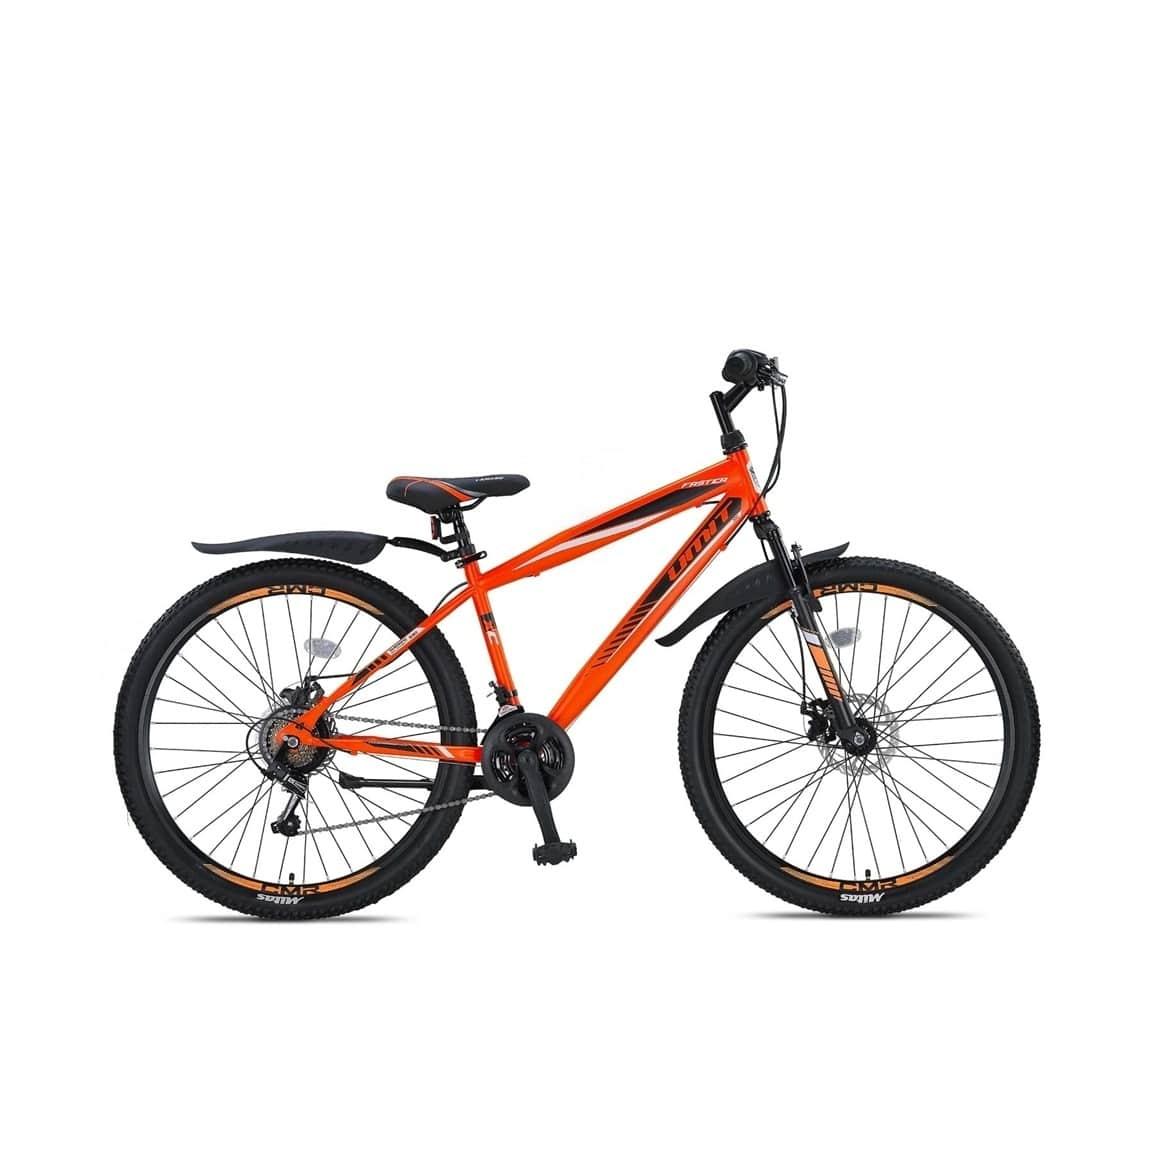 Umit-Faster-275inch-MTB-2D-OrangeBlack-min.jpg